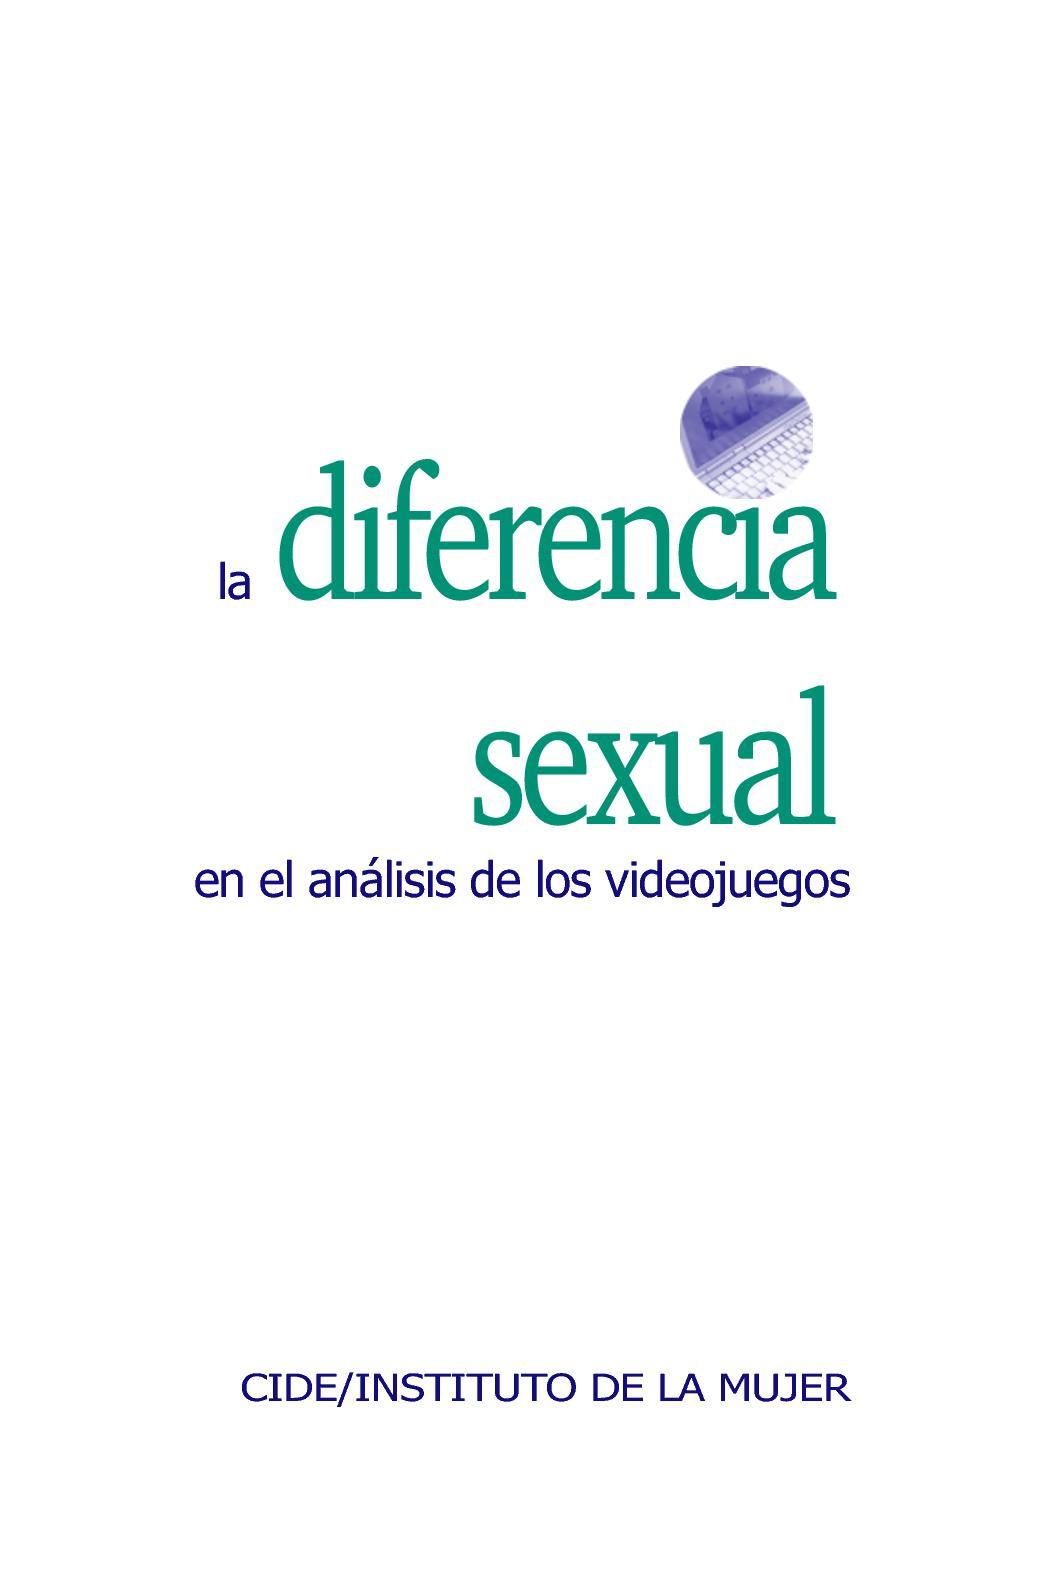 Calaméo - Diferencia Sexual Analisis Videojuegos 5a110d880f749